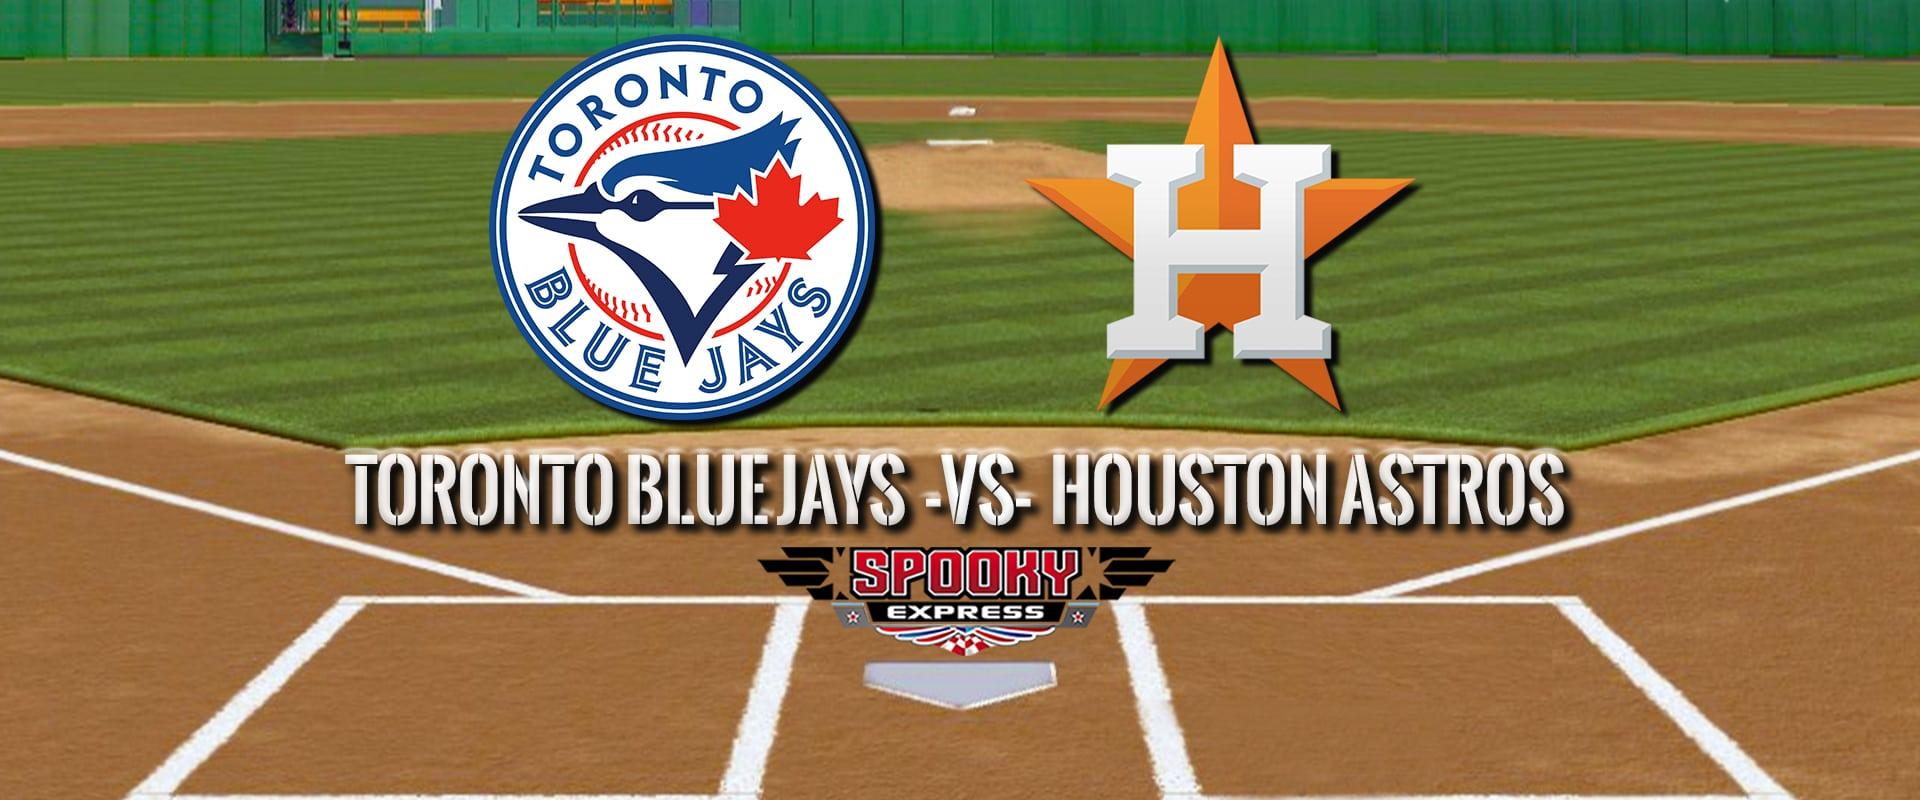 MLB Betting Preview: Toronto Blue Jays vs. Houston Astros